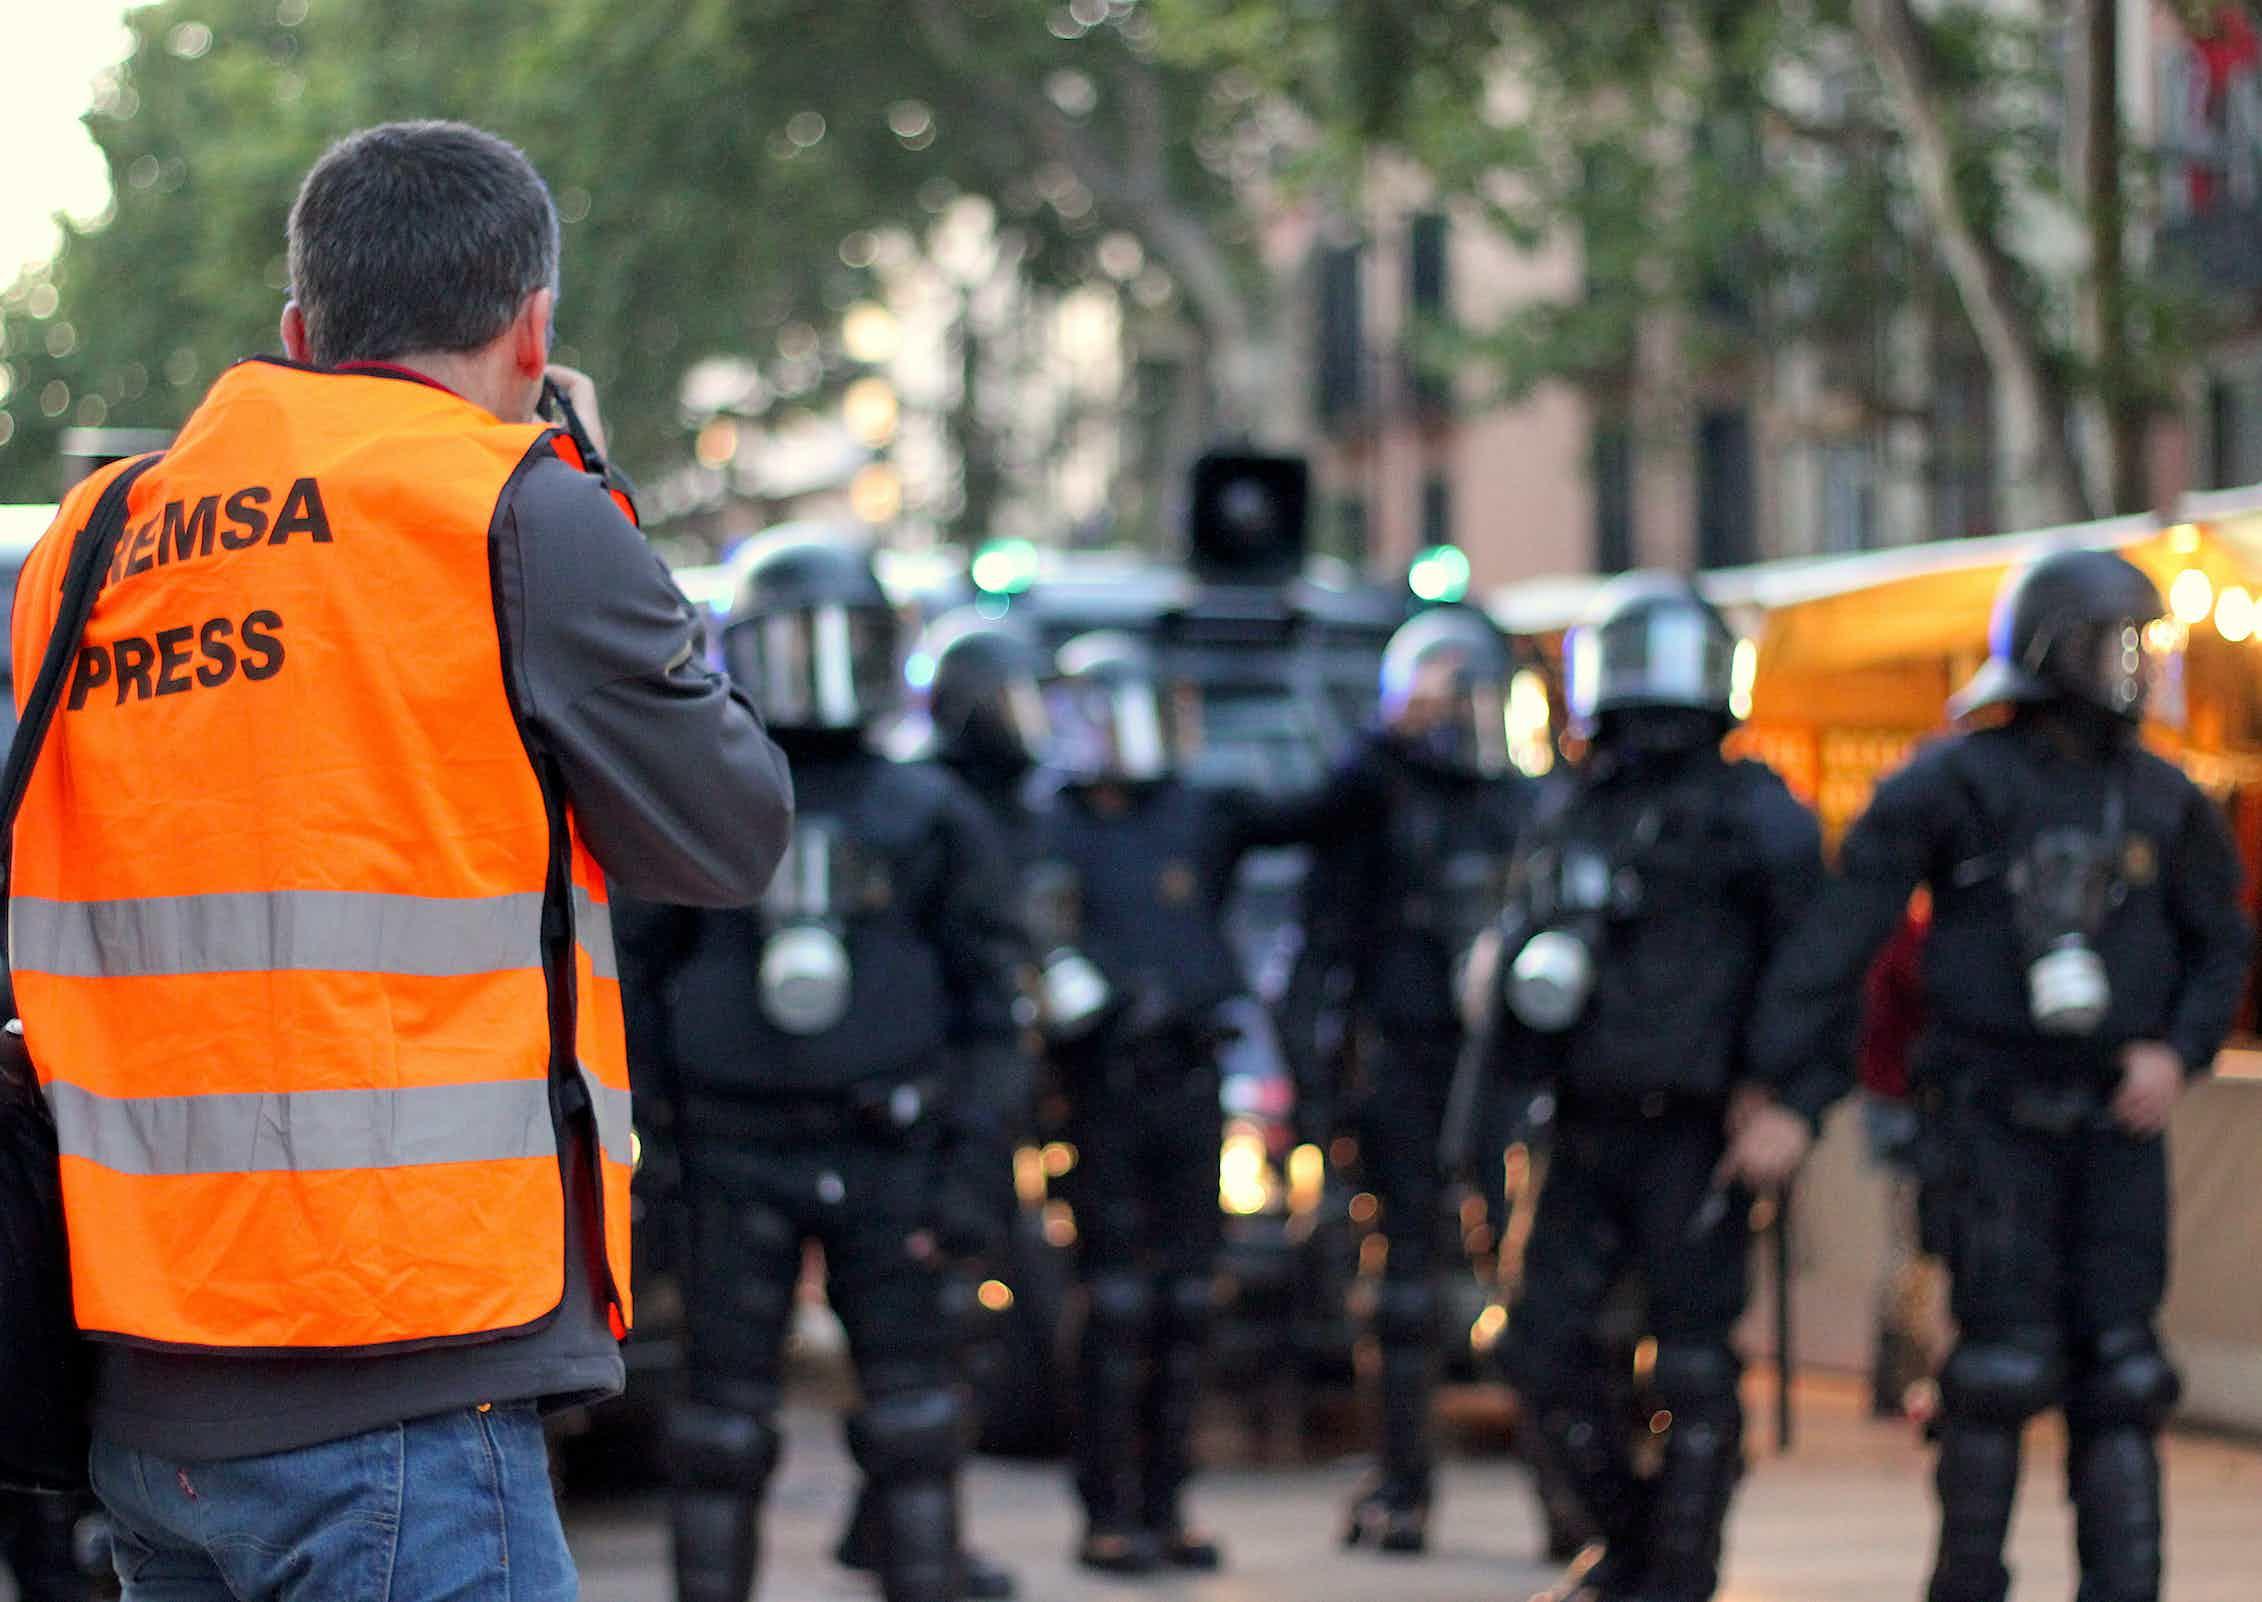 Fotoperiodista trabaja ante varios policías durante un desalojo en Barcelona en 2014.Shutterstock / VCalvo - Control